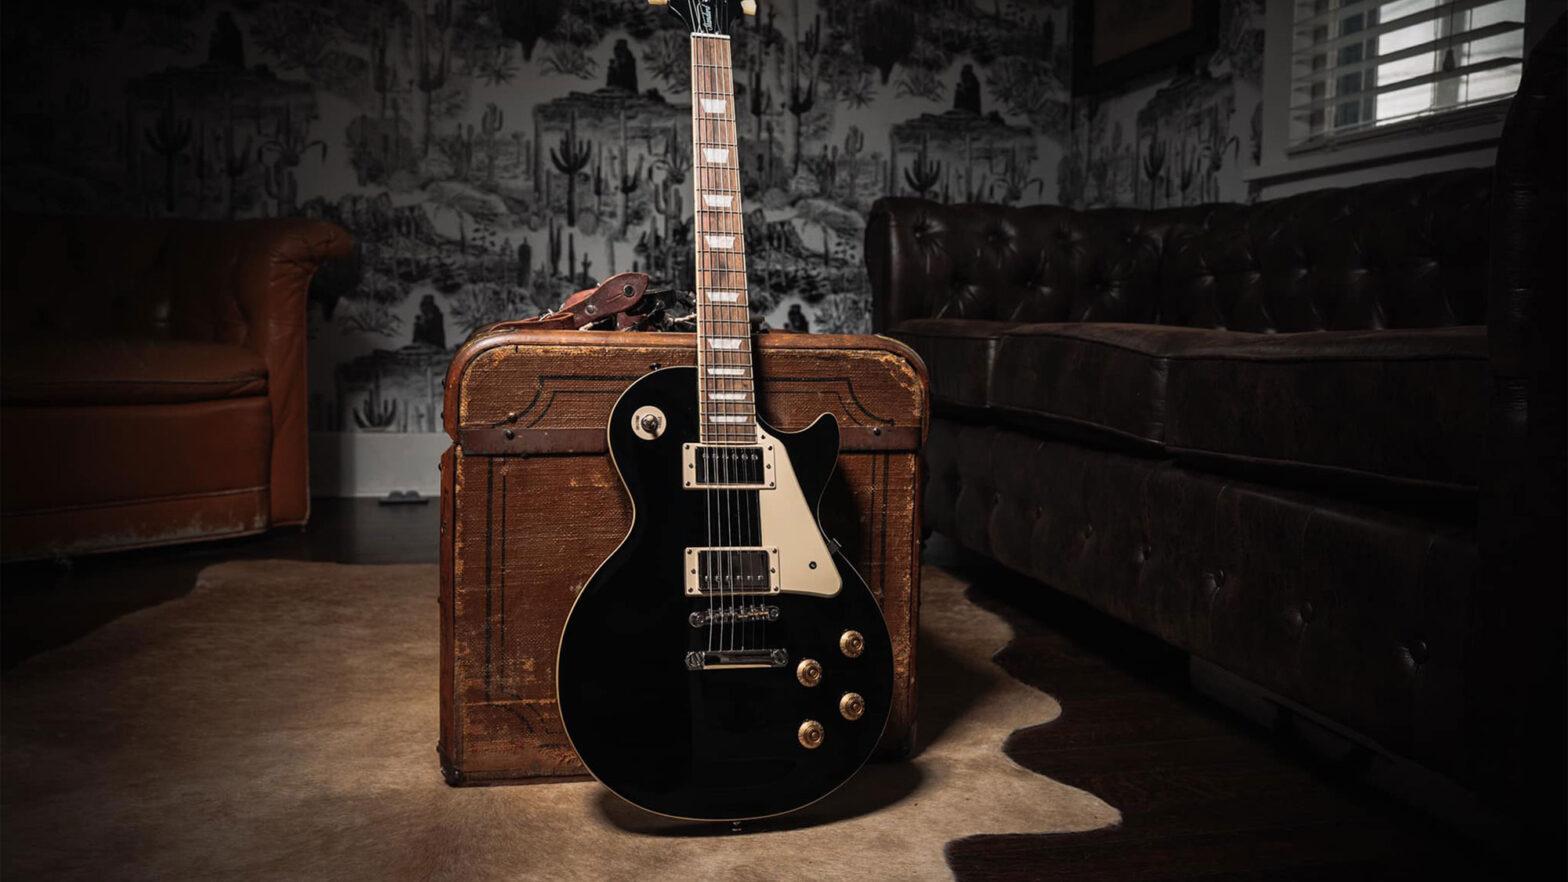 Epiphone Les Paul Standard 50s Guitar in Ebony